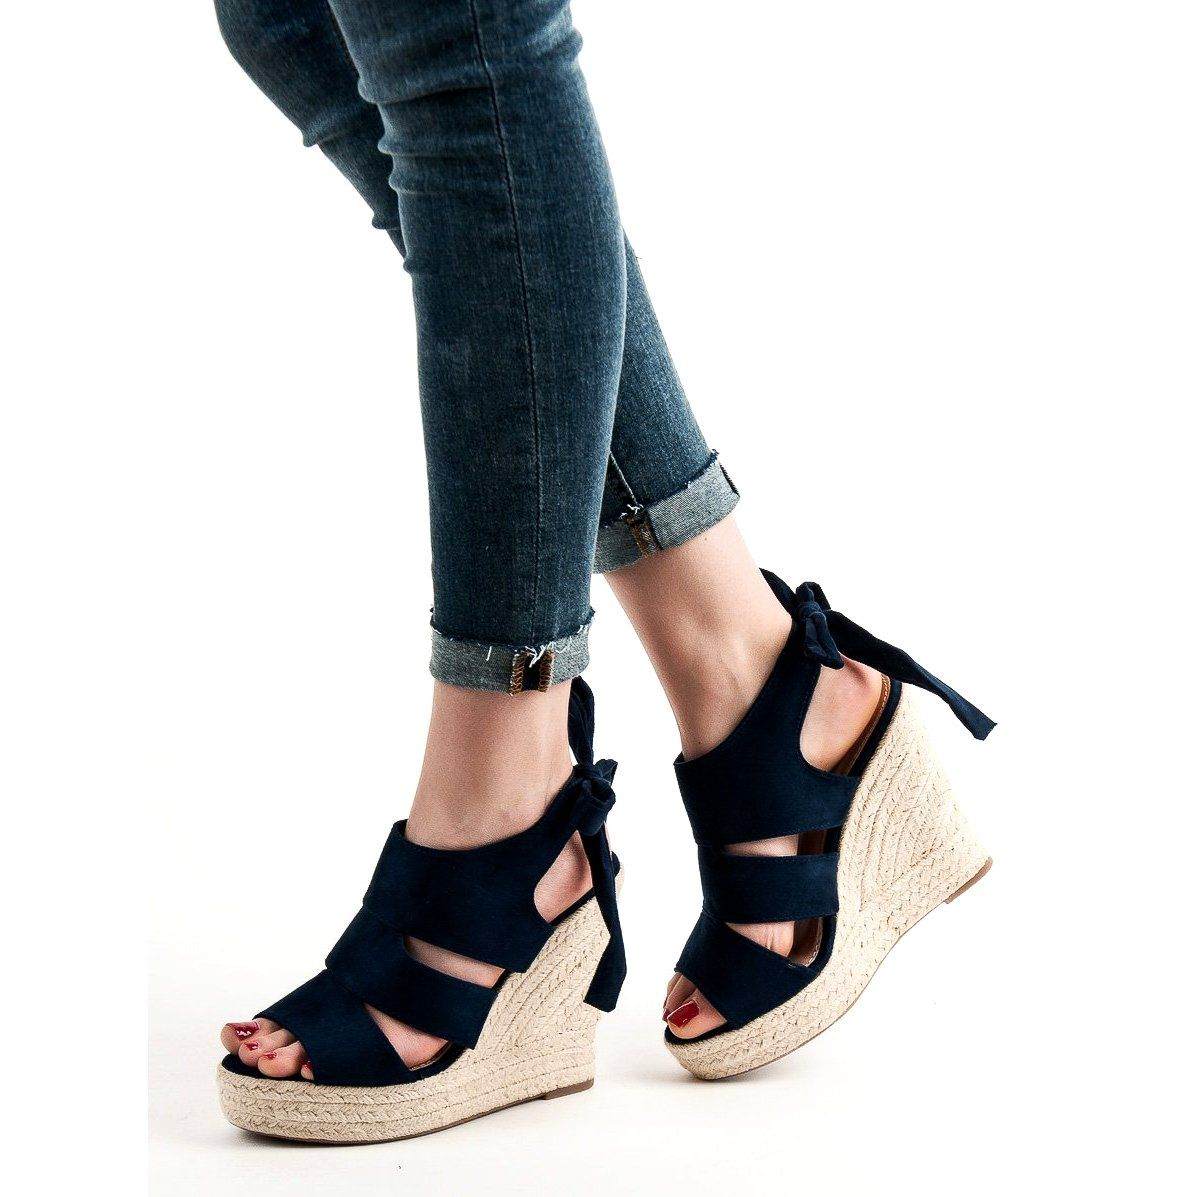 Cm Paris Granatowe Sandaly Na Koturnie Sandal Espadrille Wedge Espadrille Espadrilles